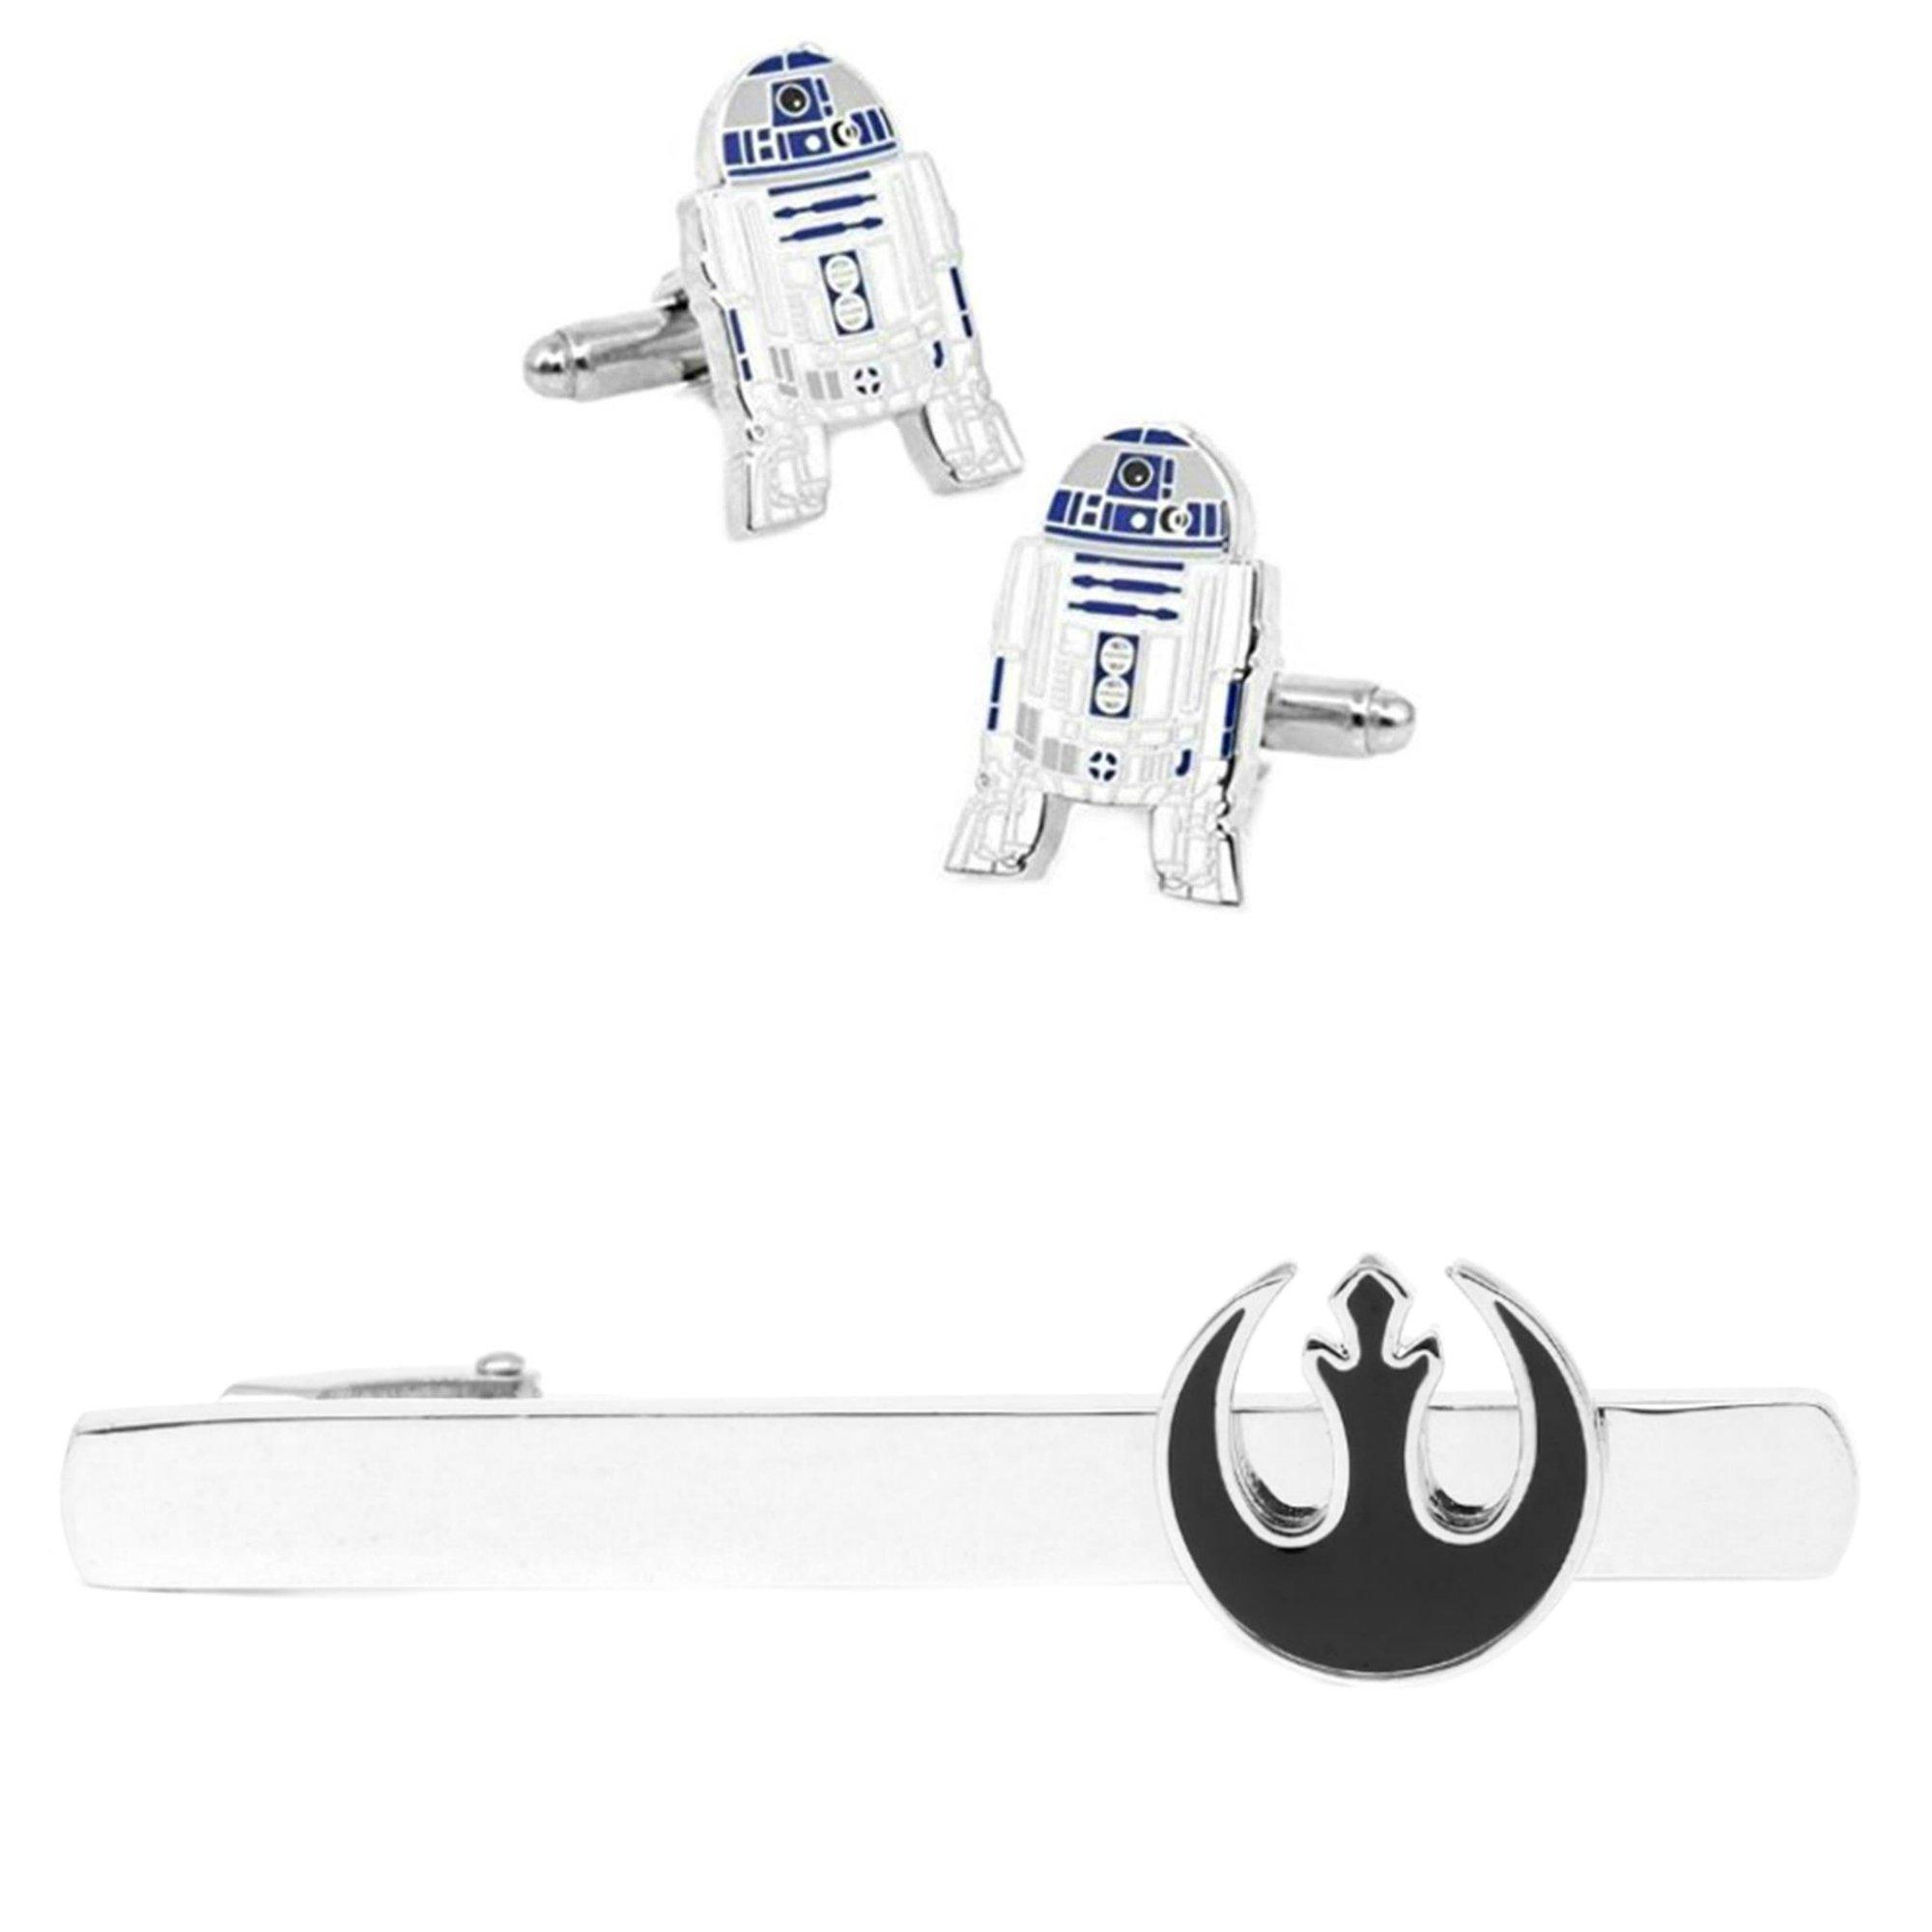 Outlander R2-D2 Cufflink & Rebel Black Tiebar - New 2018 Star Wars Movies - Set of 2 Wedding Logo w/Gift Box by Outlander